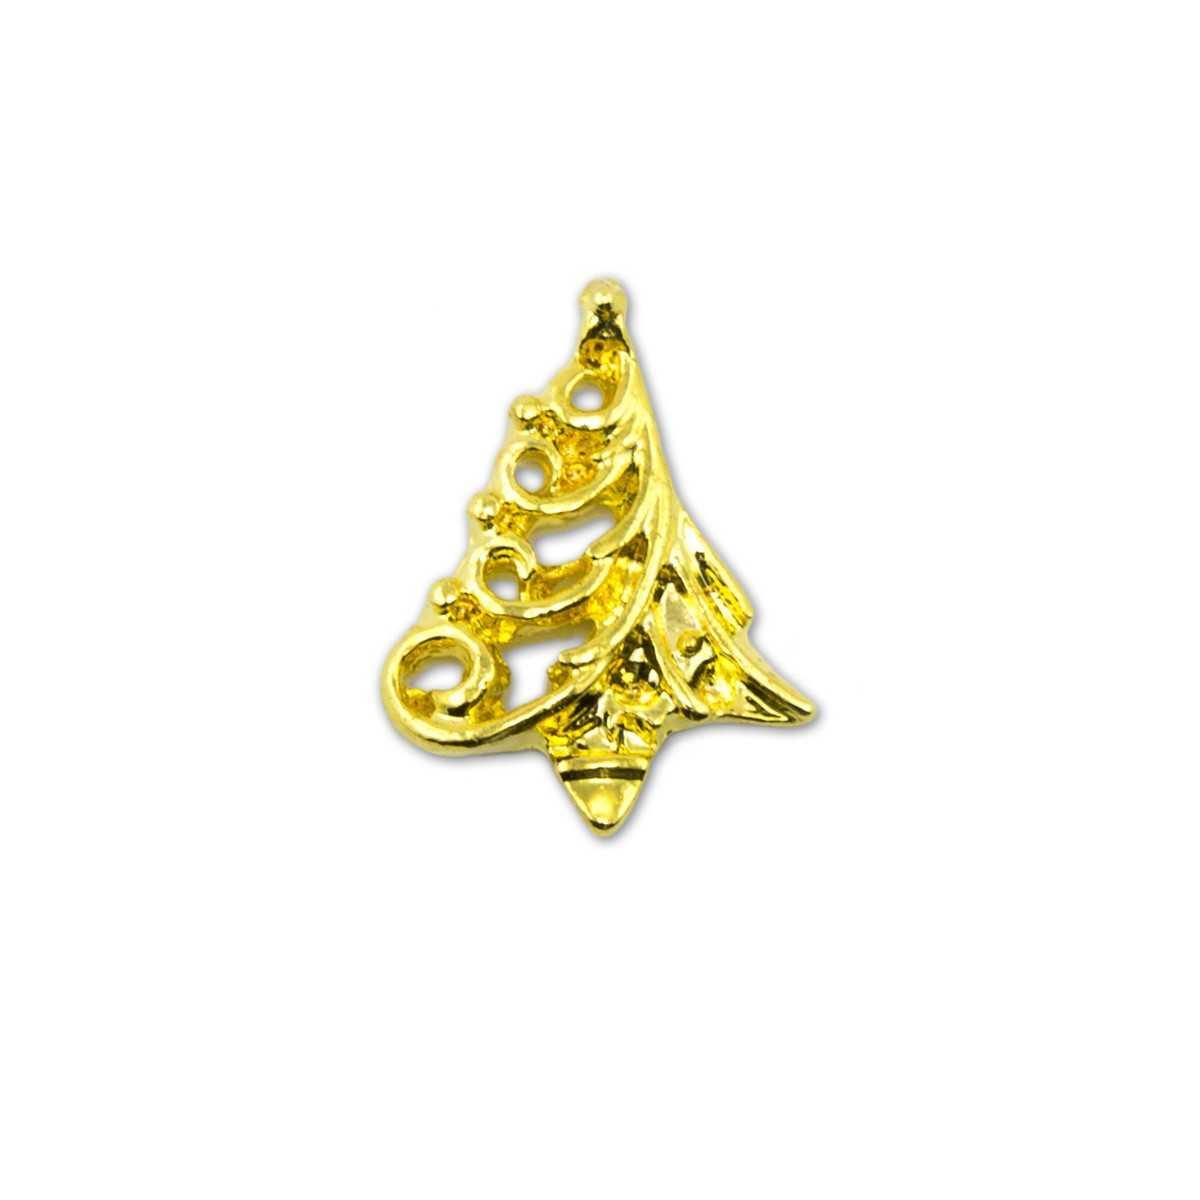 https://www.kit-manucure.com/1526-thickbox_default/bijoux-3d-ongles-sapin-doré.jpg